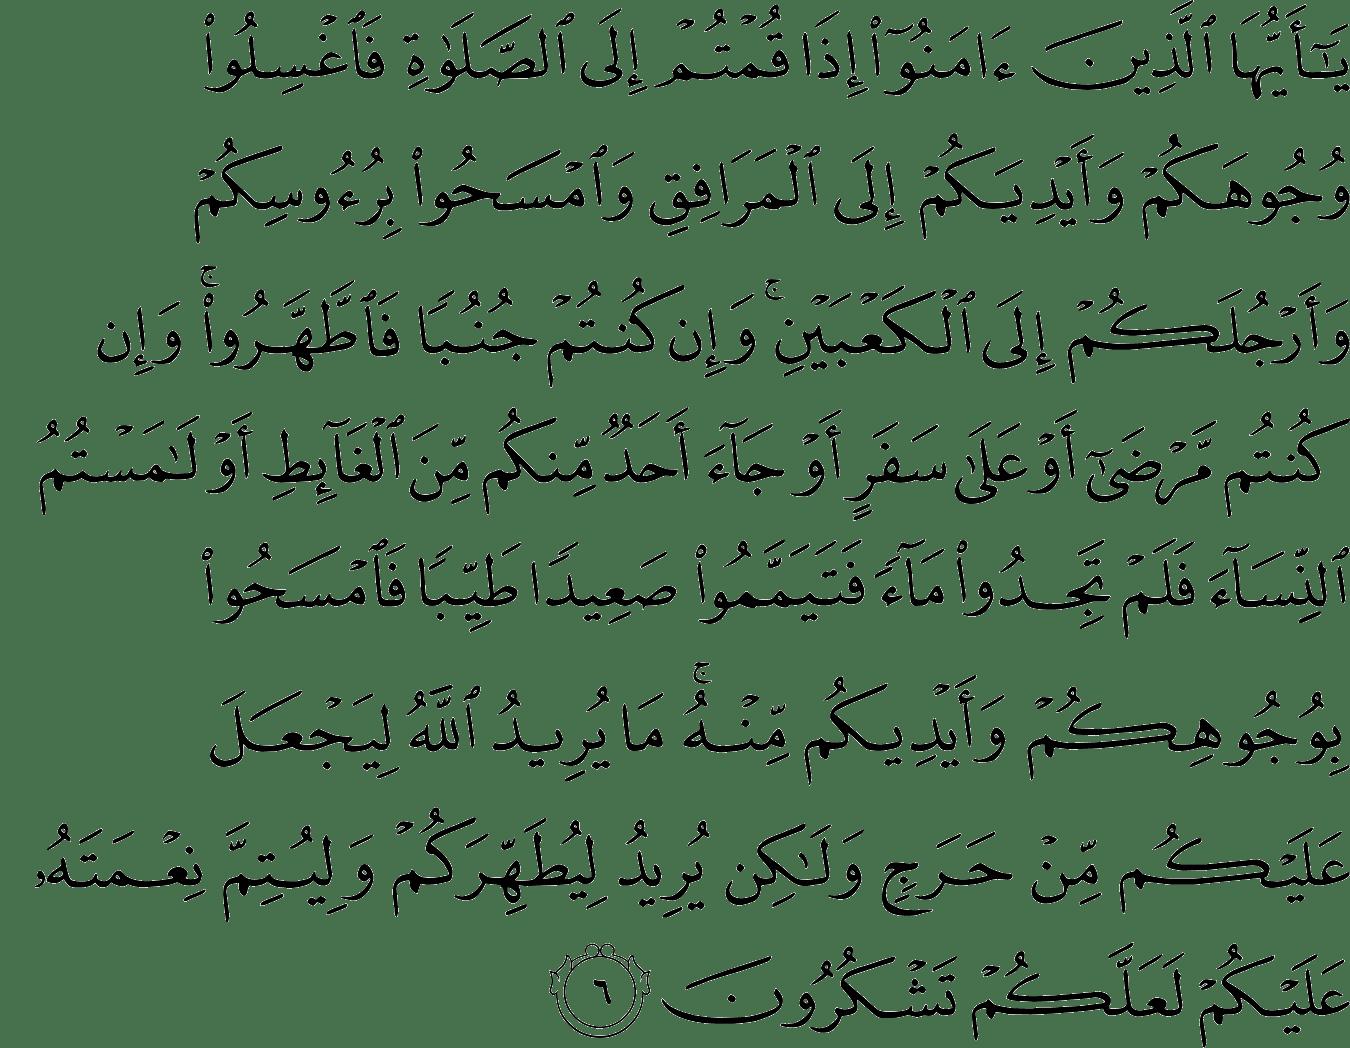 Surat Al Maidah Ayat 6 Tafsir Bacaan Dan Terjemahan Qs